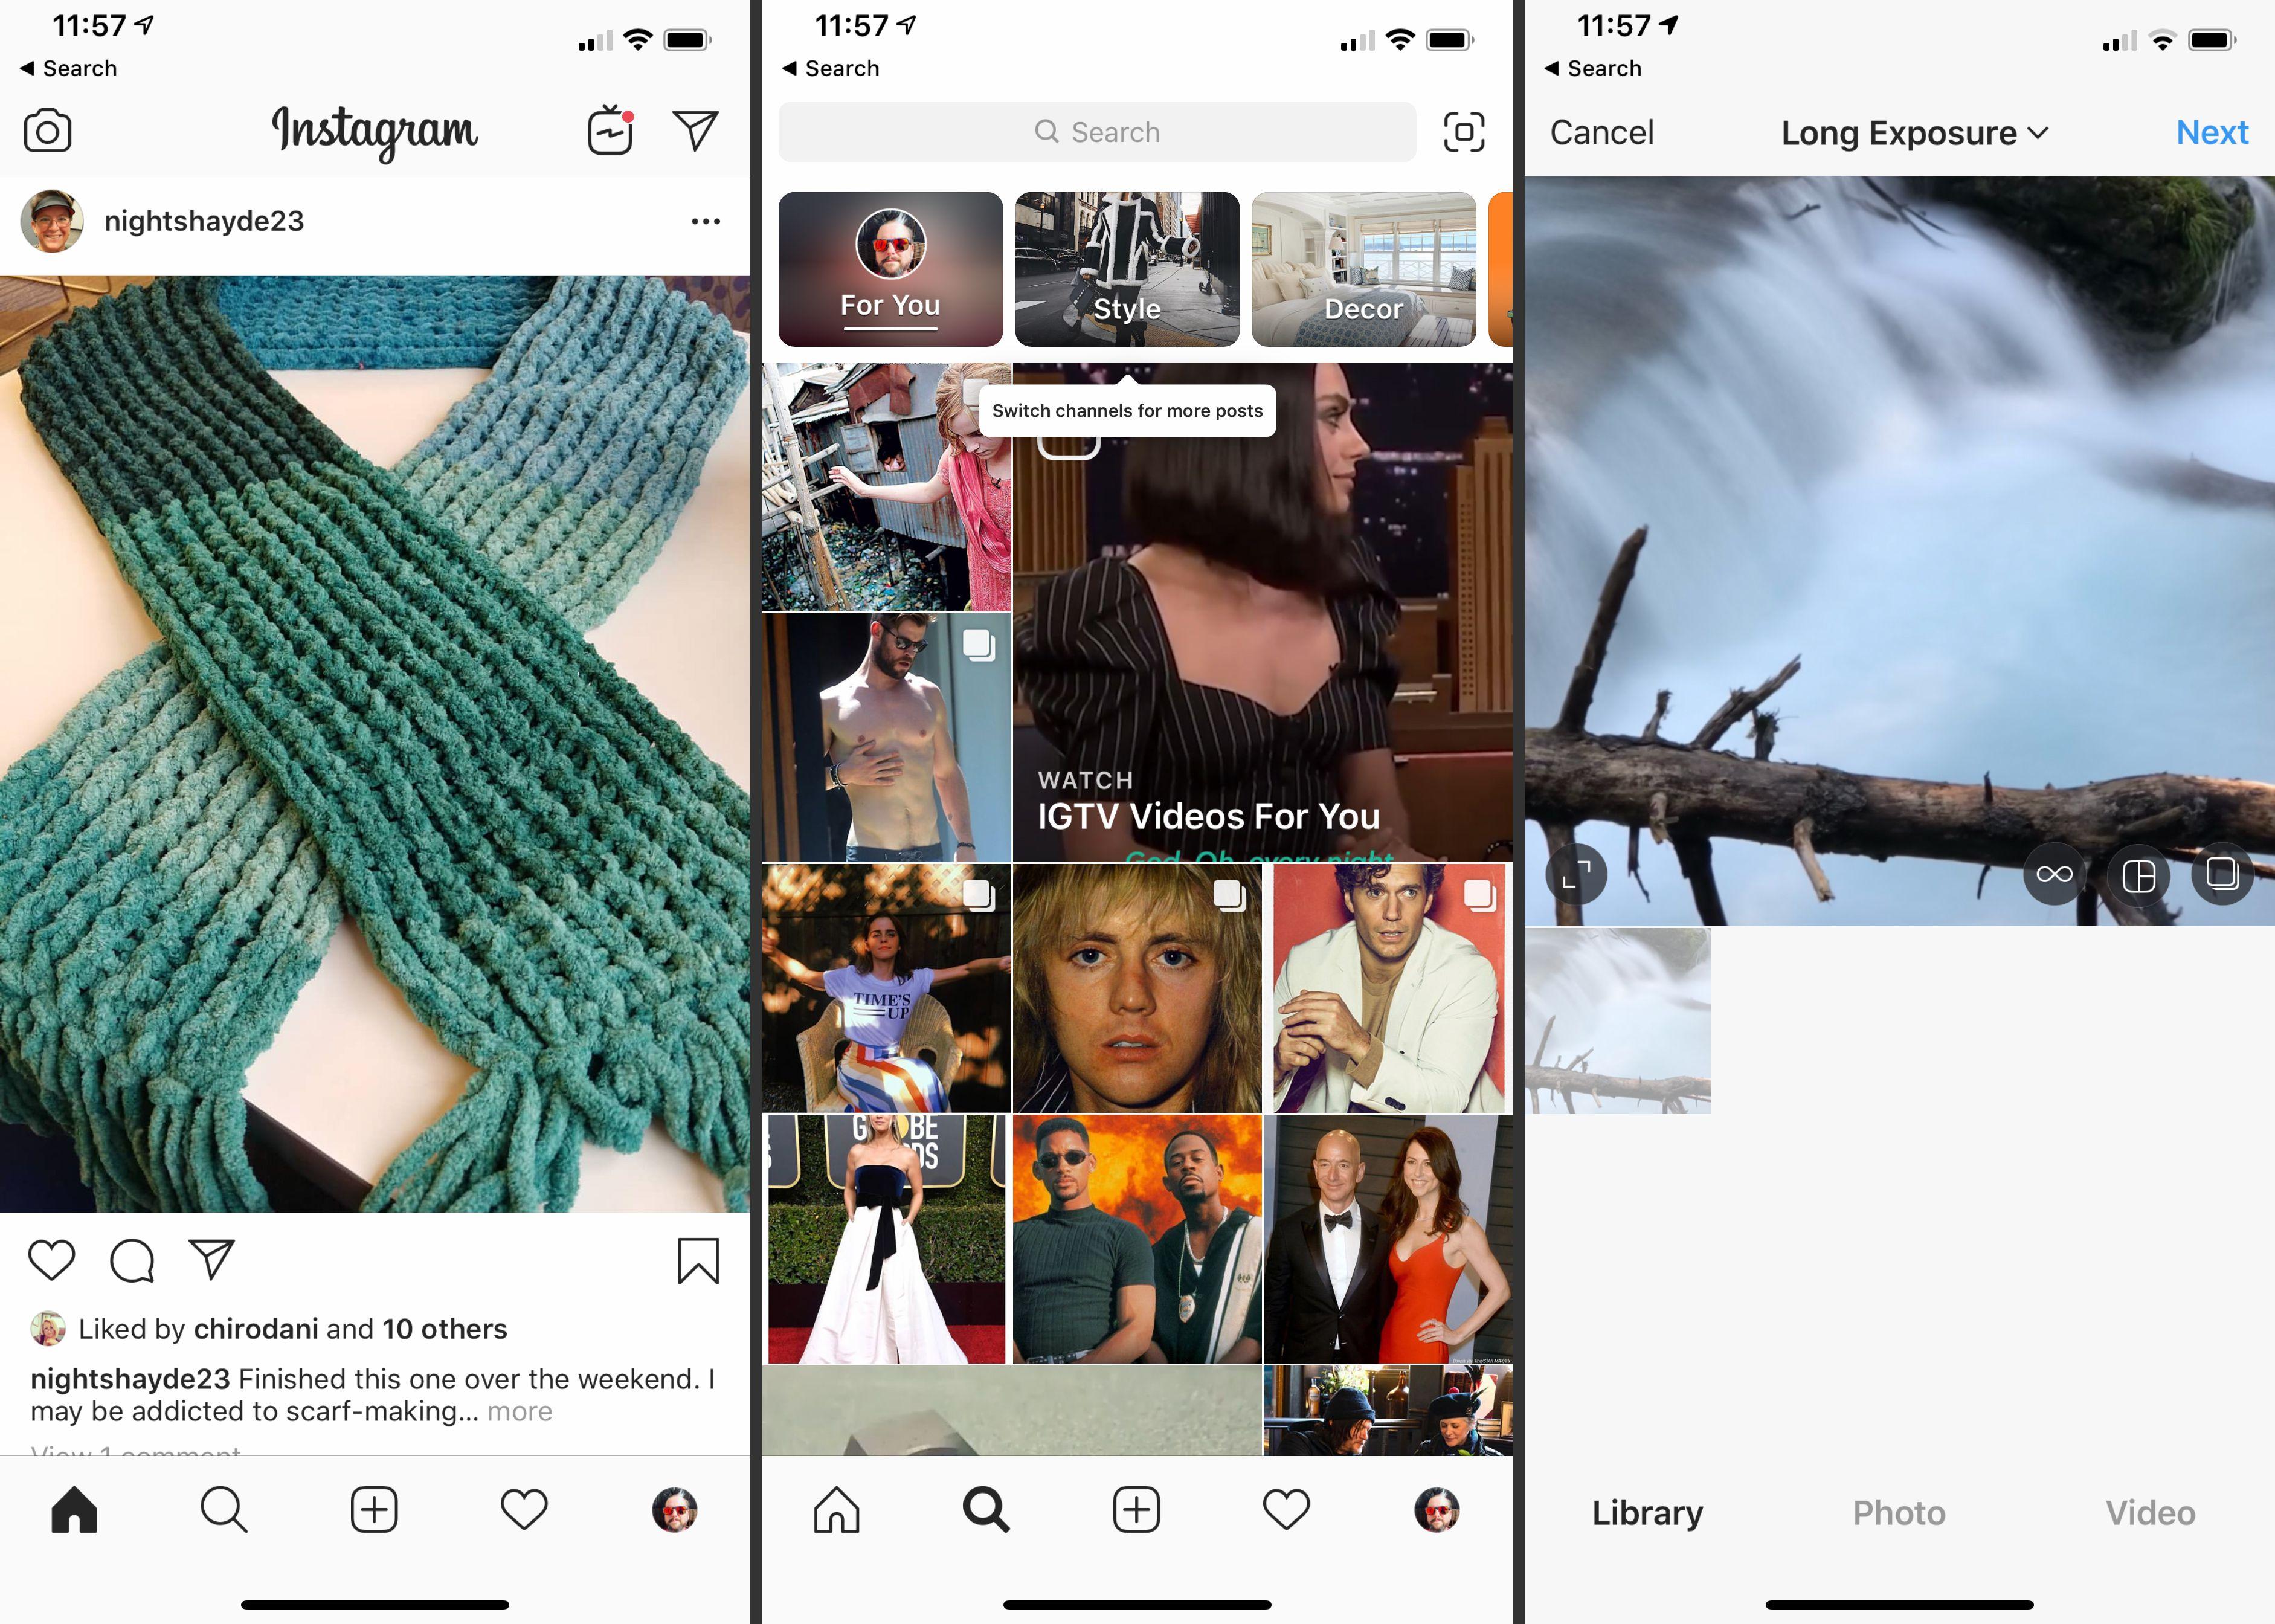 Three iOS Instagram screens